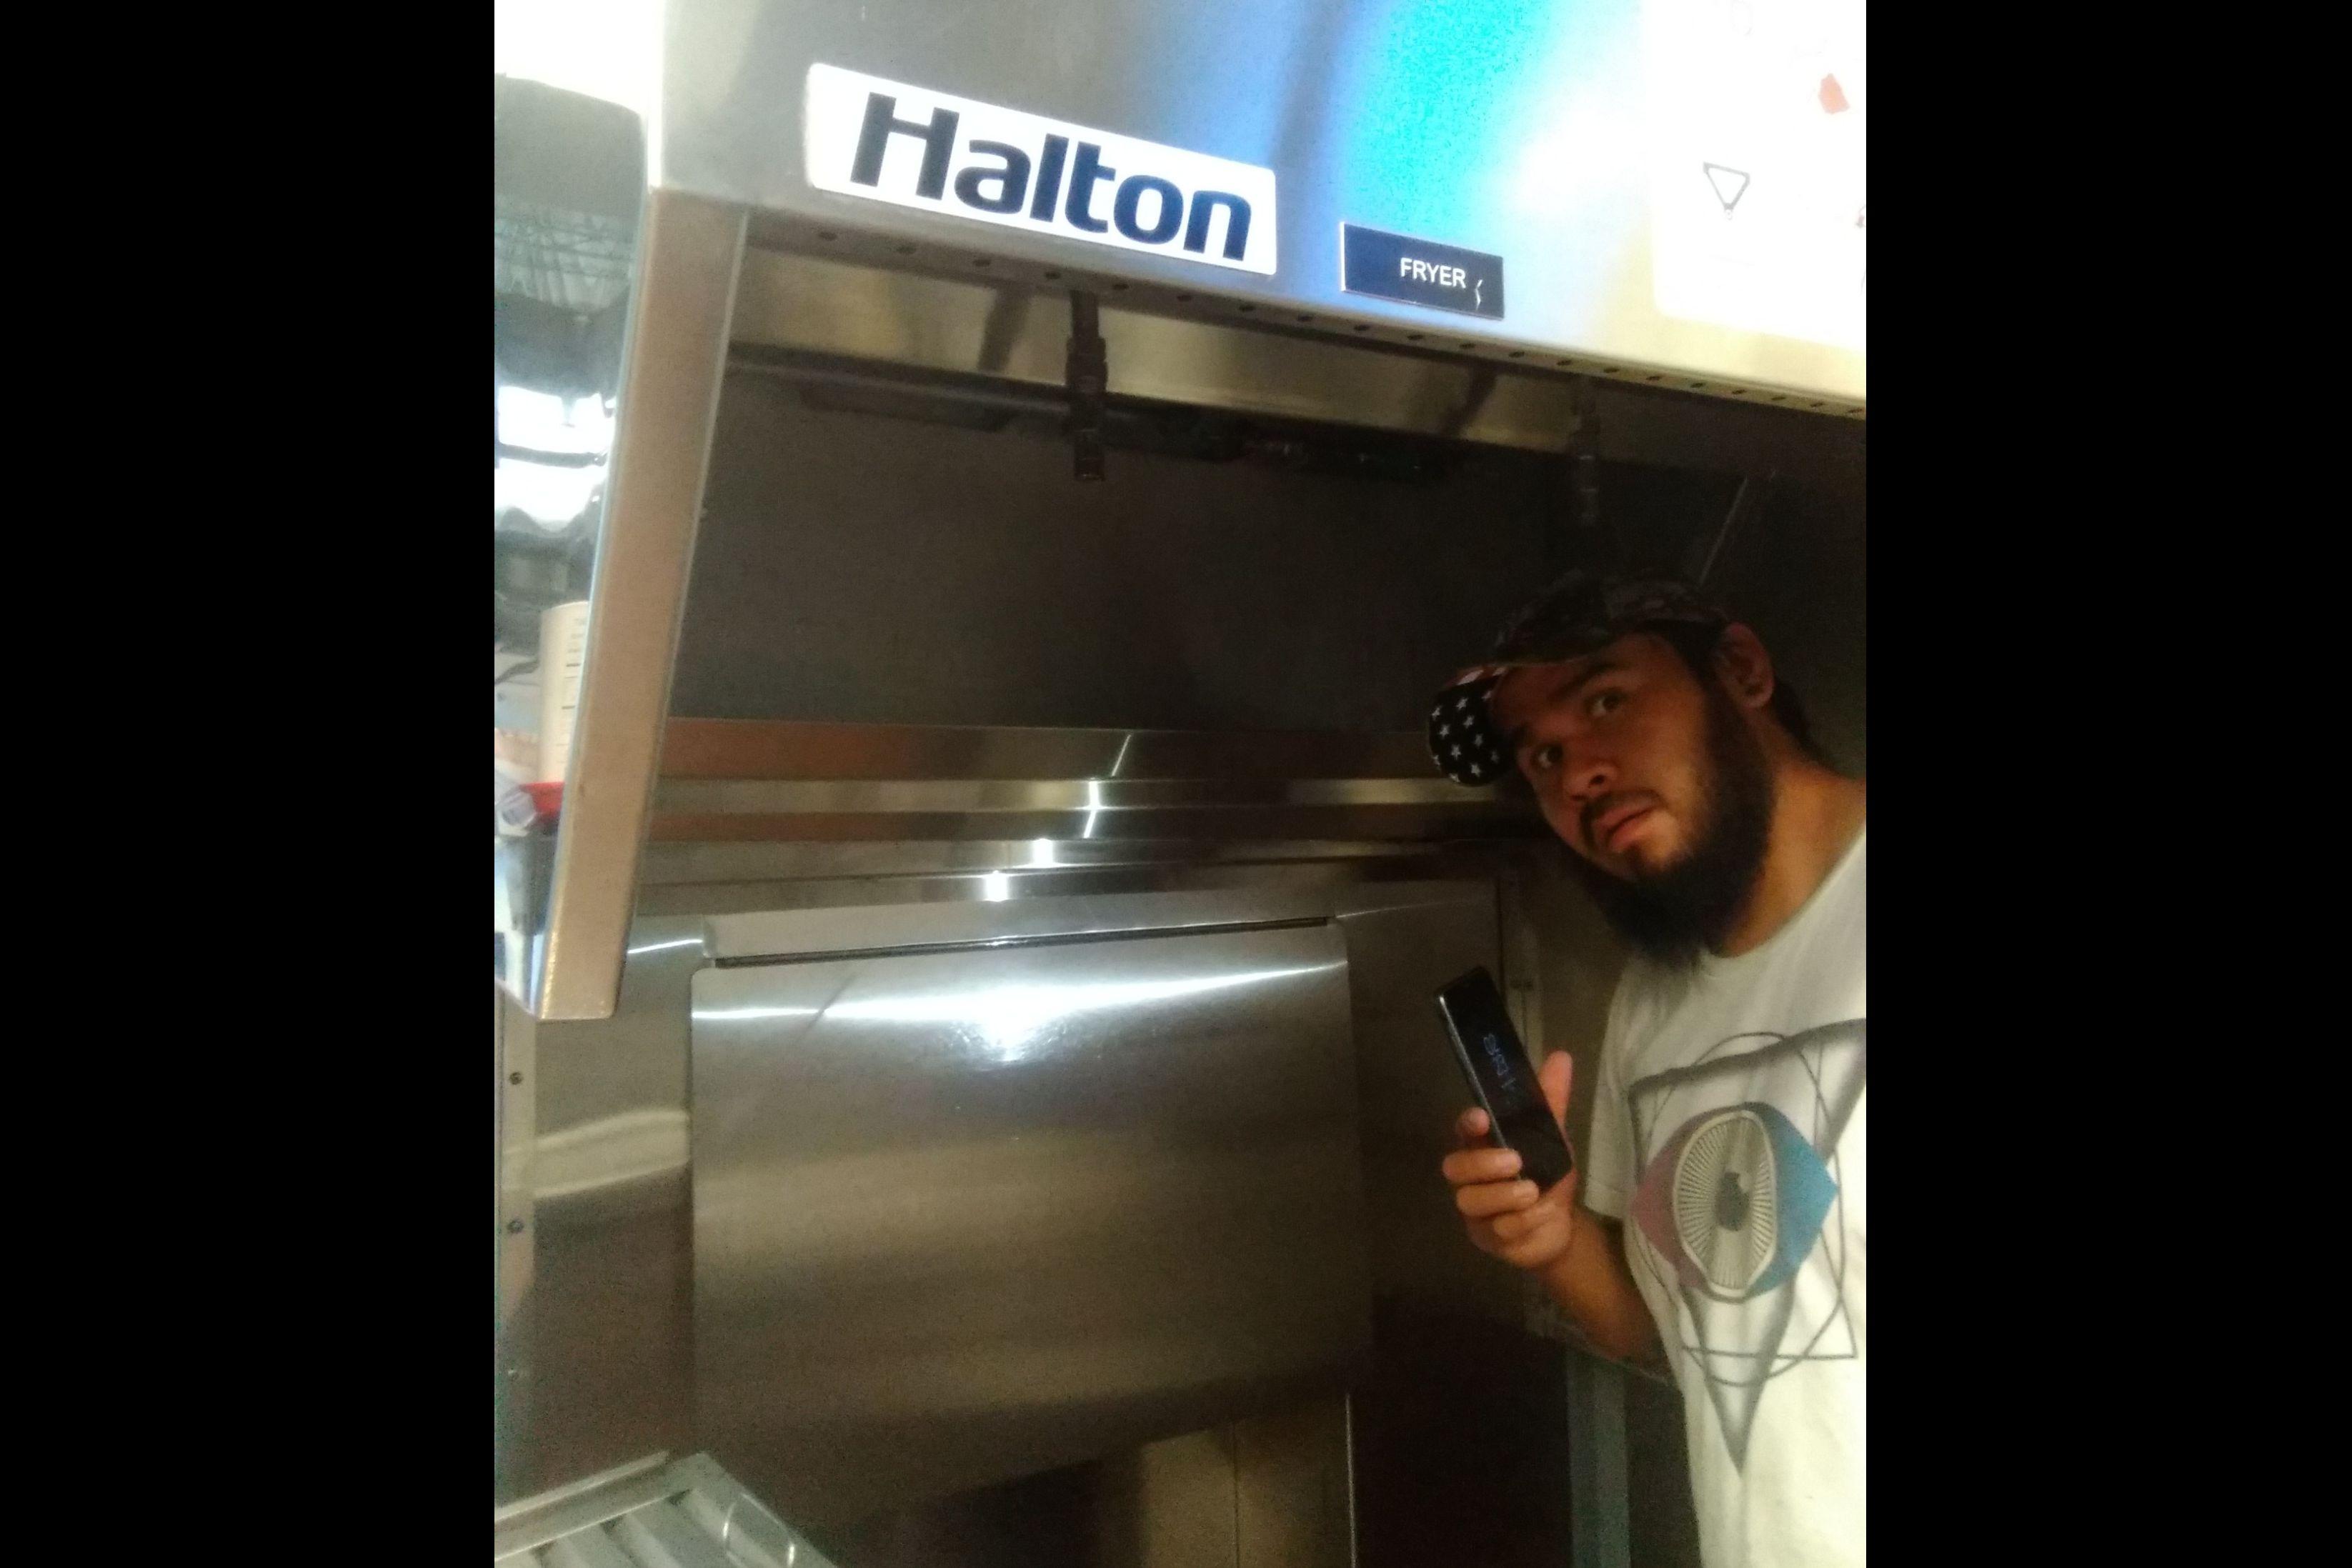 Halton Fryer